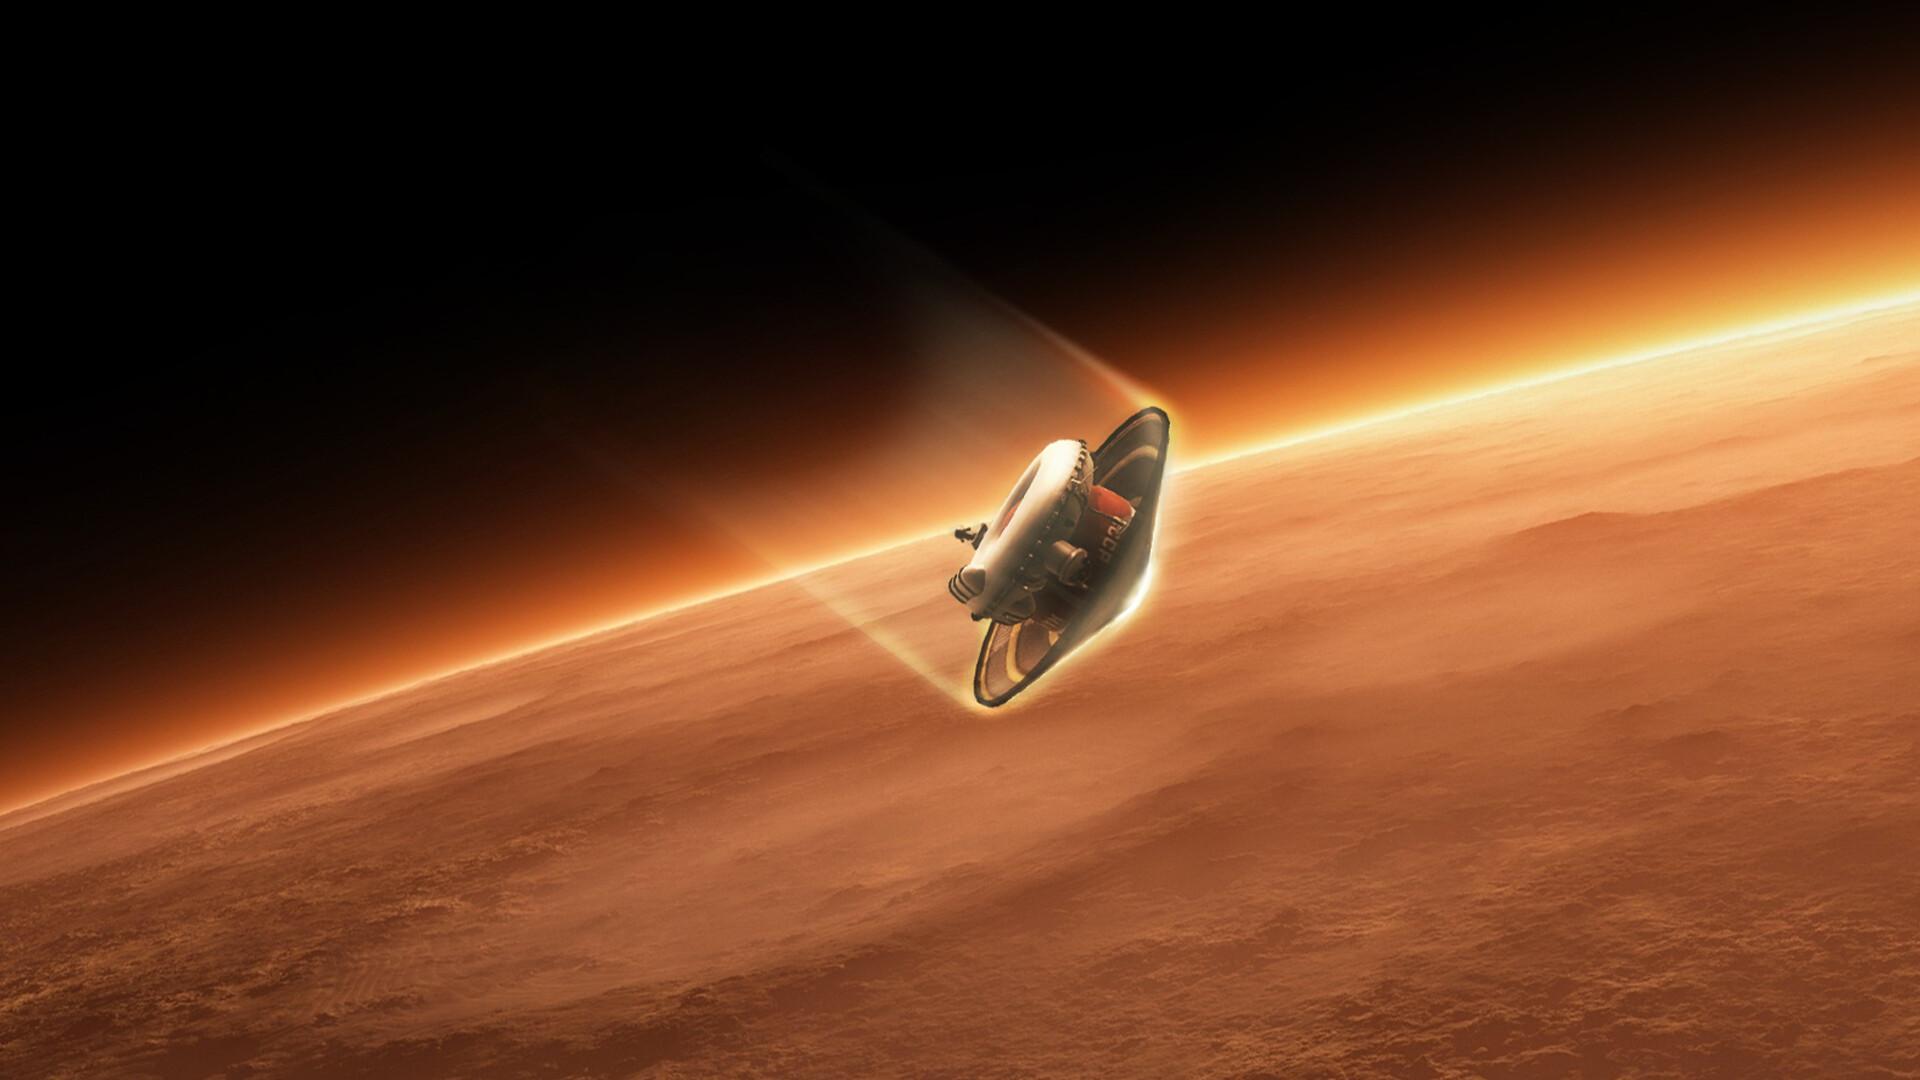 Mars 3 Landing module